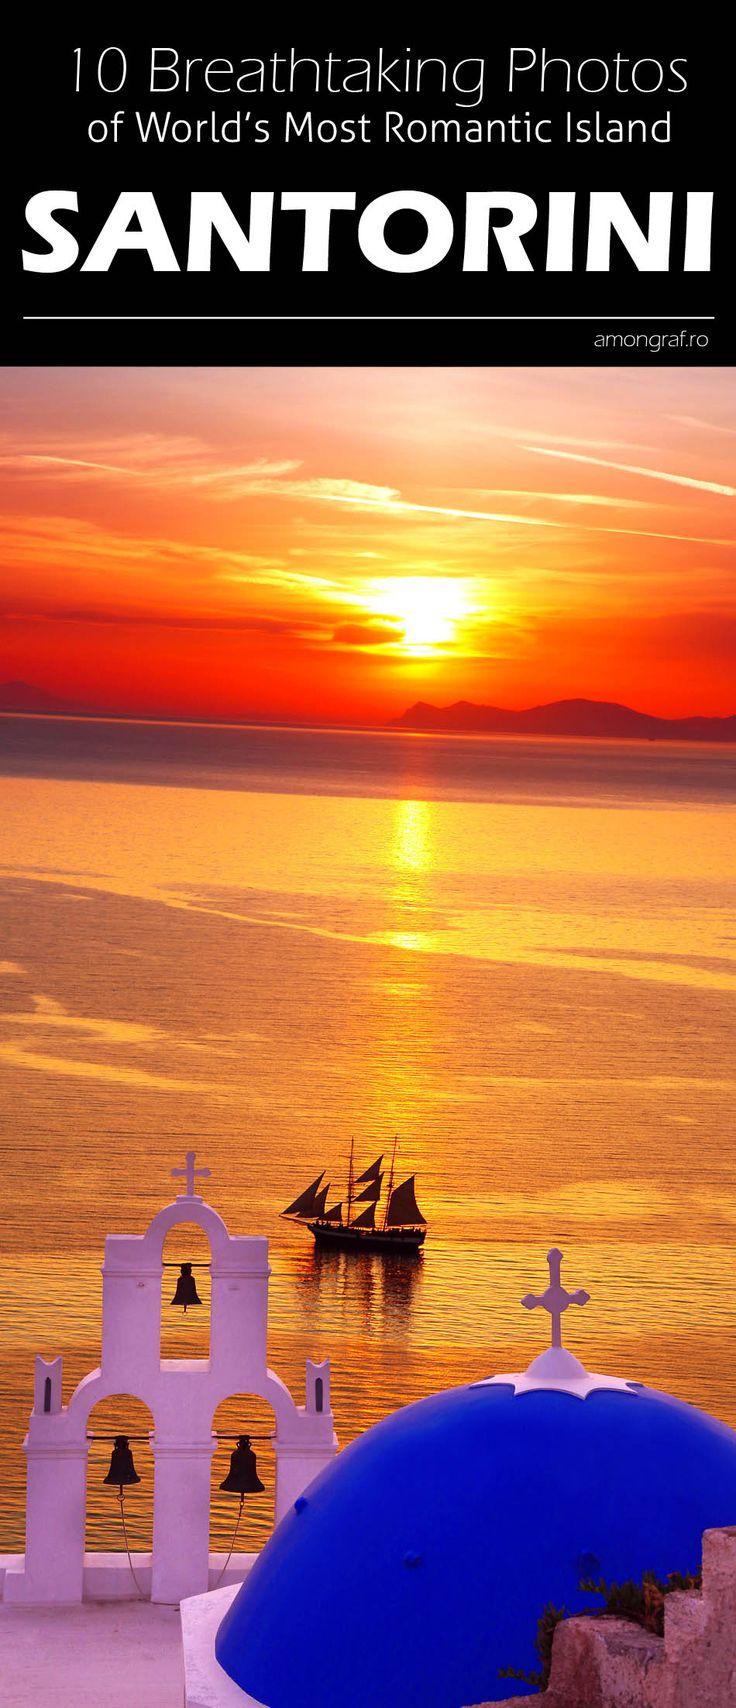 10 Breathtaking Photos of World's Most Romantic Island, Santorini